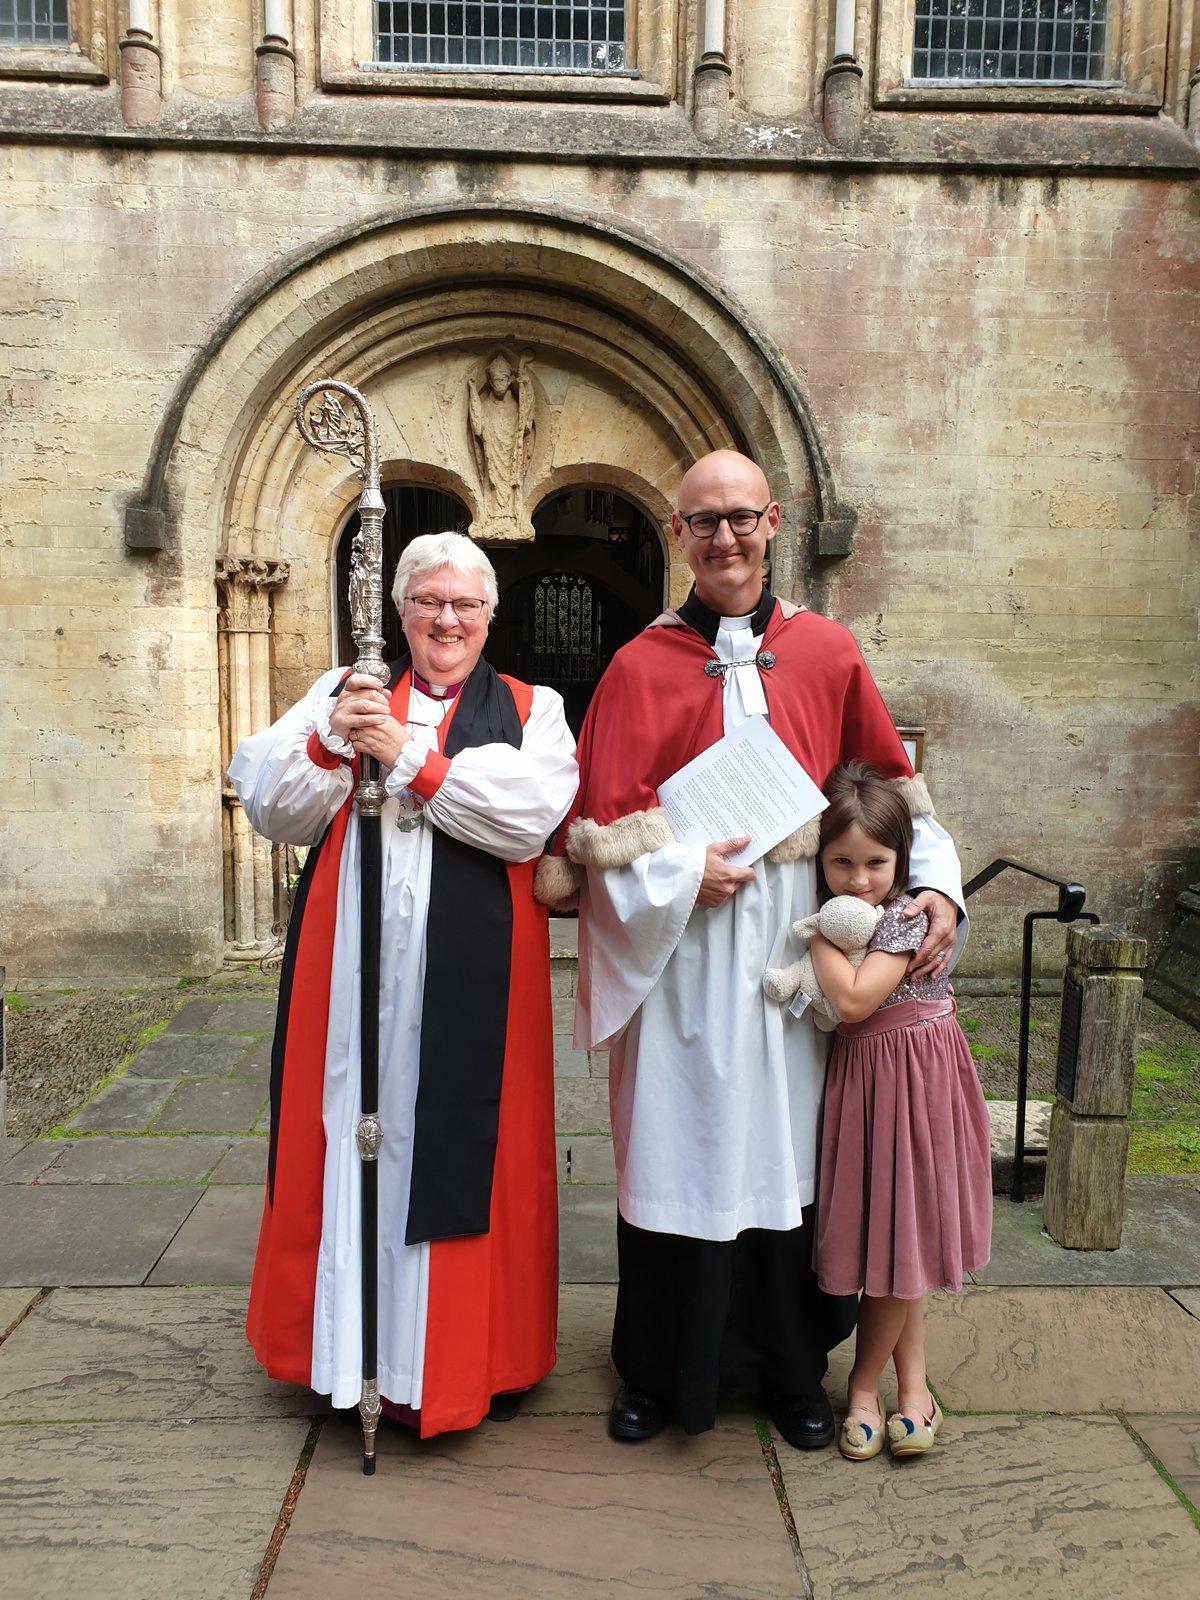 Bishop June, Rev'd Rod Green and his daughter at Llandaff Cathedral